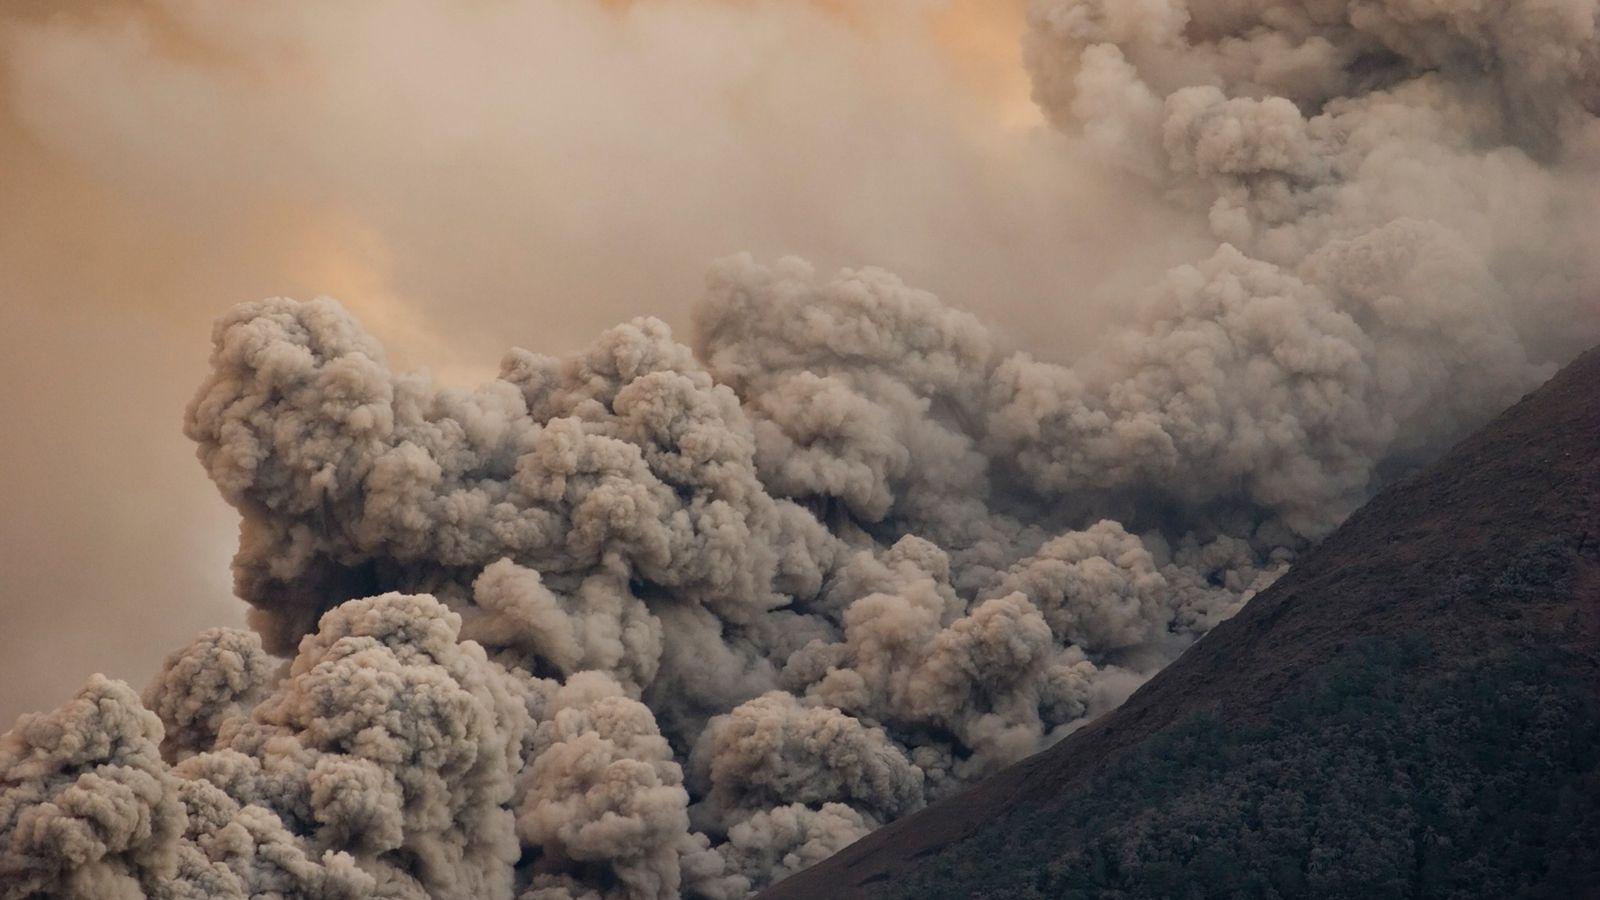 Uma quente avalanche de gases, cinzas e rochas, conhecida como fluxo piroclástico, desce pelas laterais do ...